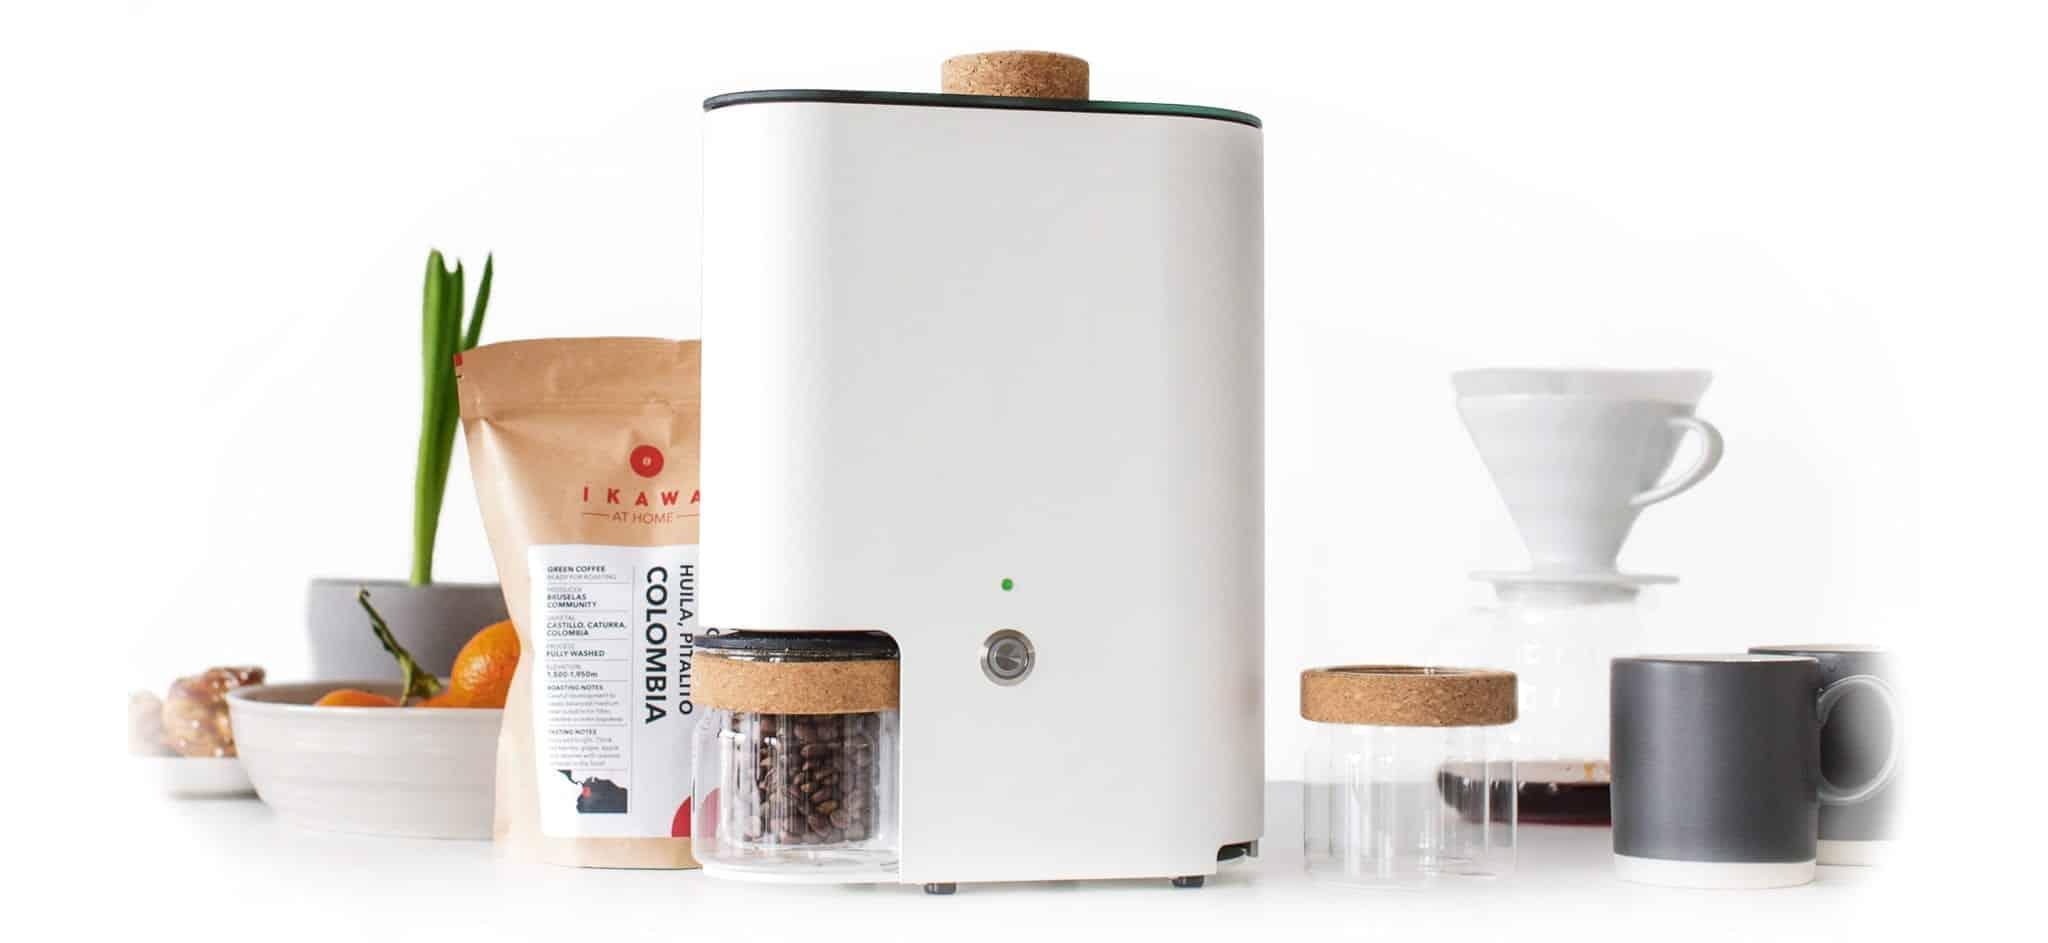 Home Roasting Coffee ~ At home ikawa coffee